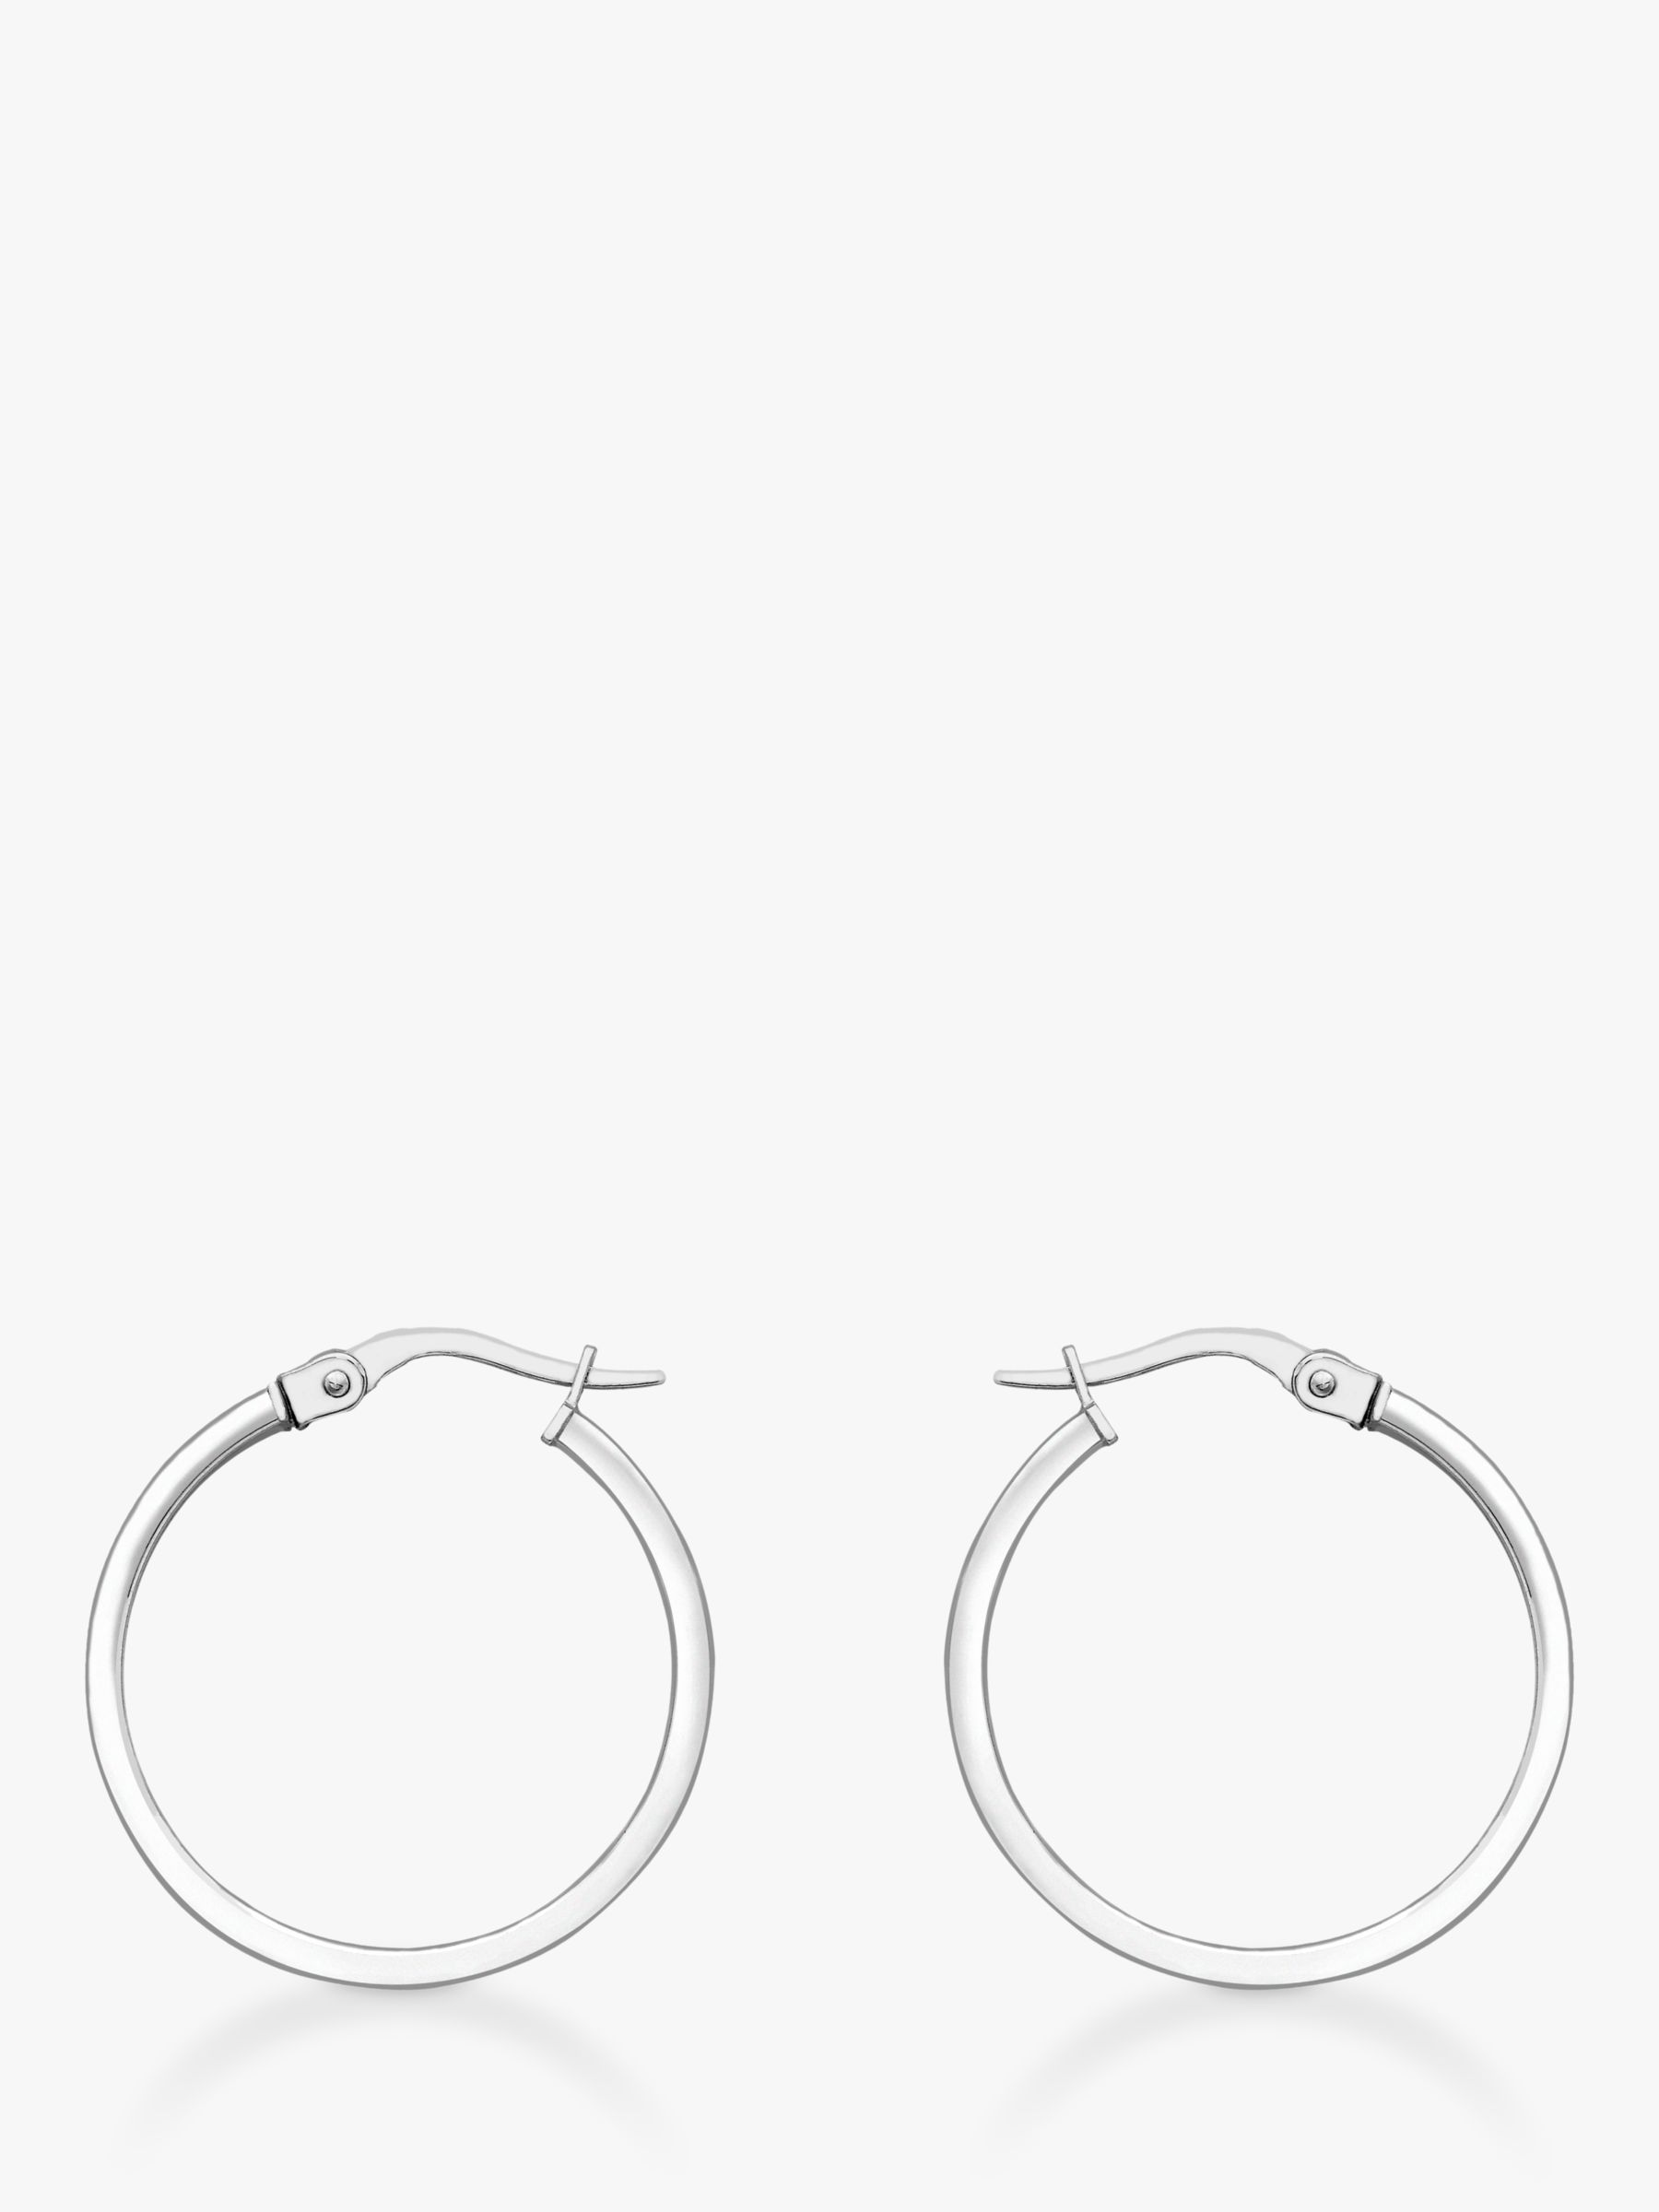 IBB IBB 18ct White Gold Rectangular Tube Creole Earrings, White Gold